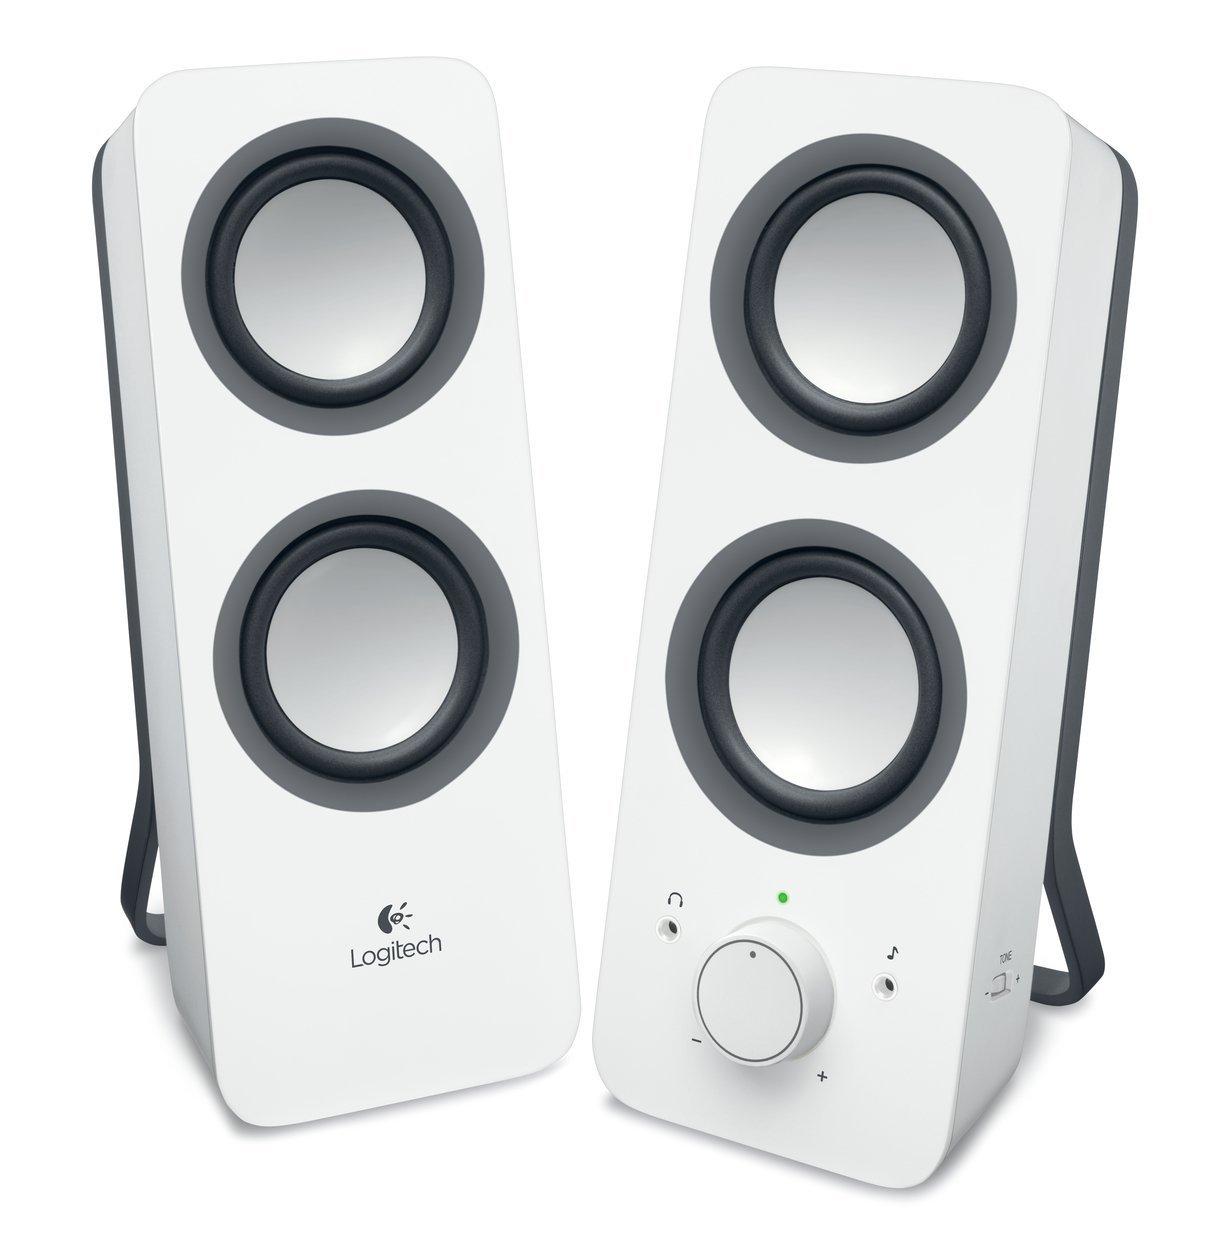 Logitech Z200 Altoparlanti Multimedia, Versione Italiana, senza Bluetooth, Bianco 2228891 10Watt PCSpeaker casse